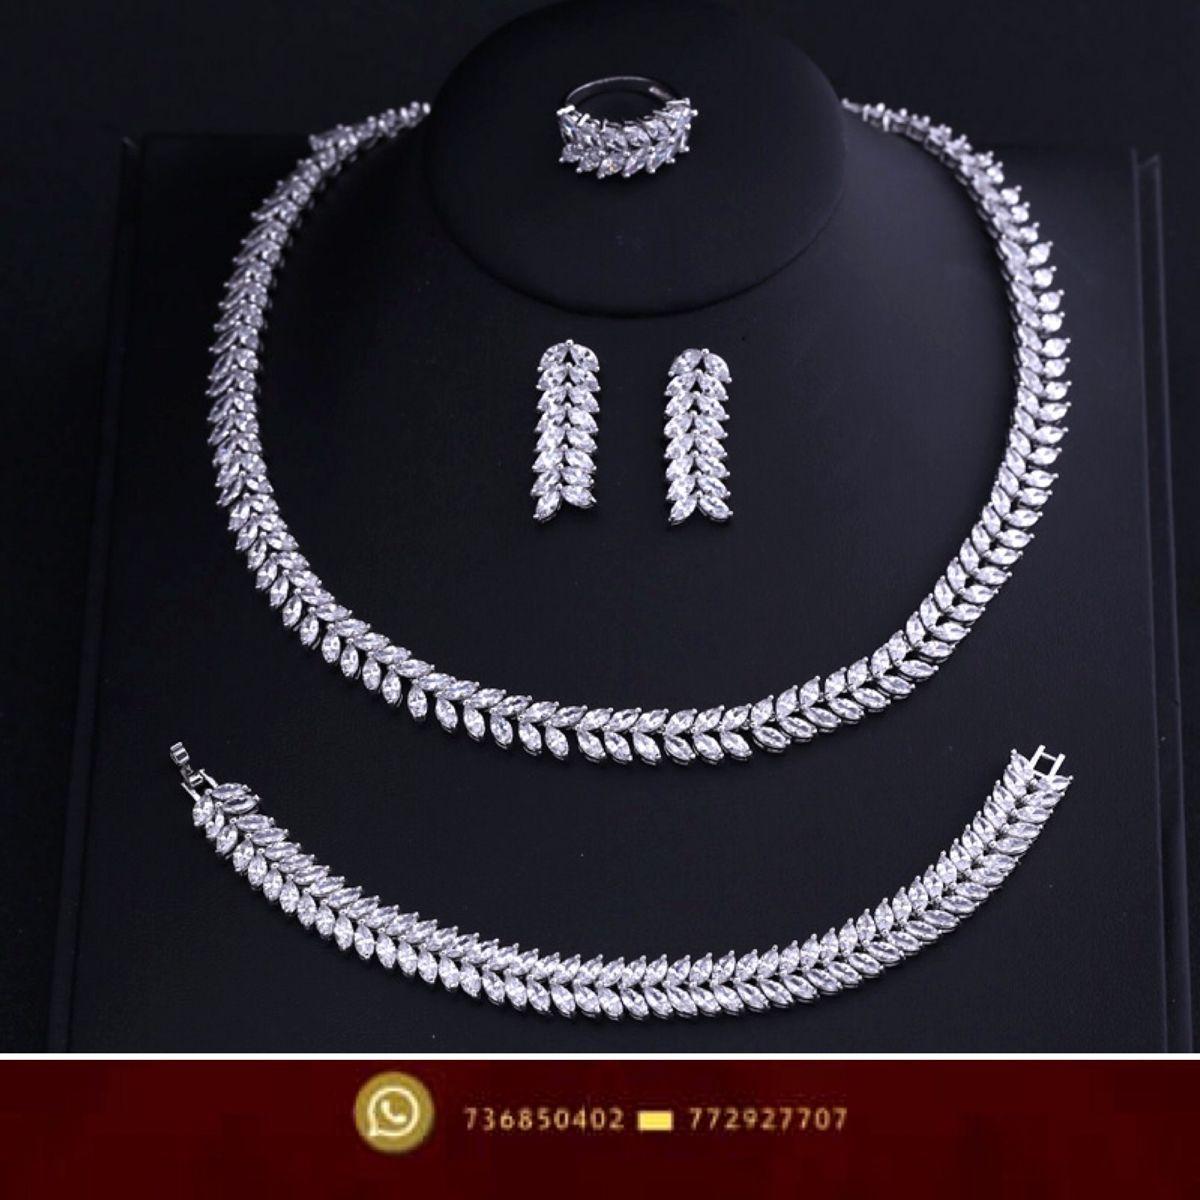 طقم اطقم زركون صنعاء فضة هداياء Diamond Necklace Diamond Necklace